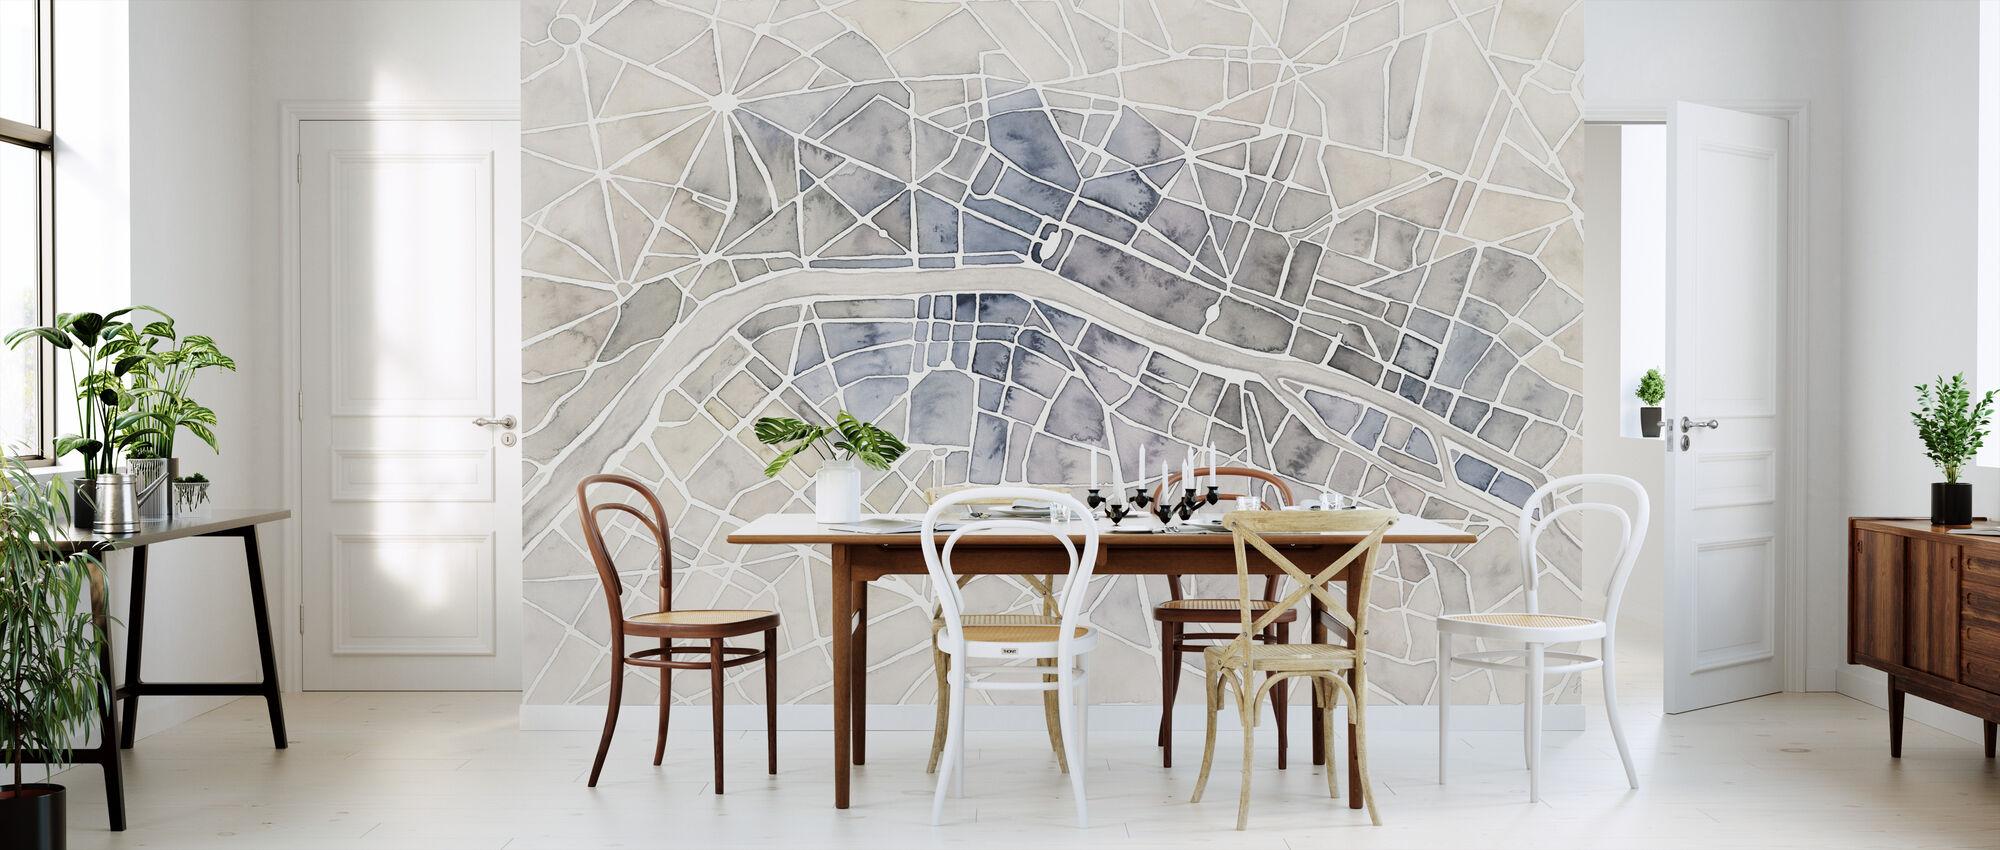 Watercolor Wanderlust Paris - Wallpaper - Kitchen